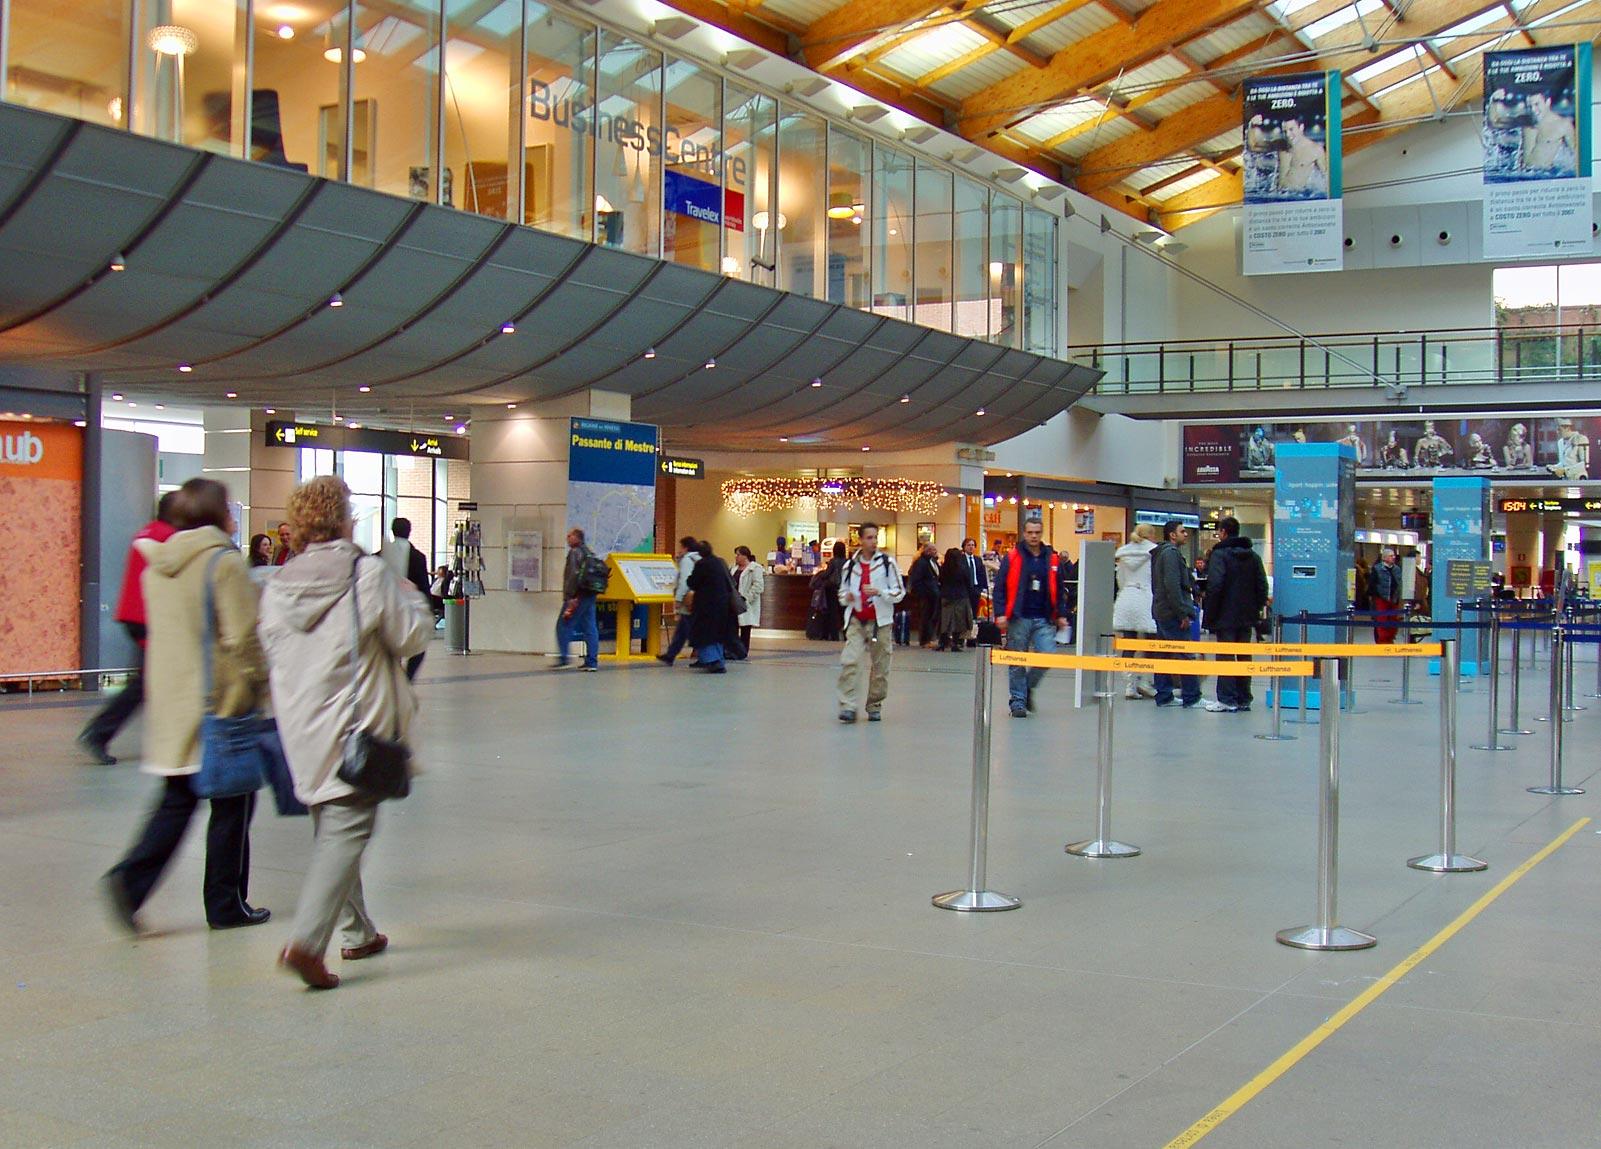 аэропорт Венеции Марко Поло